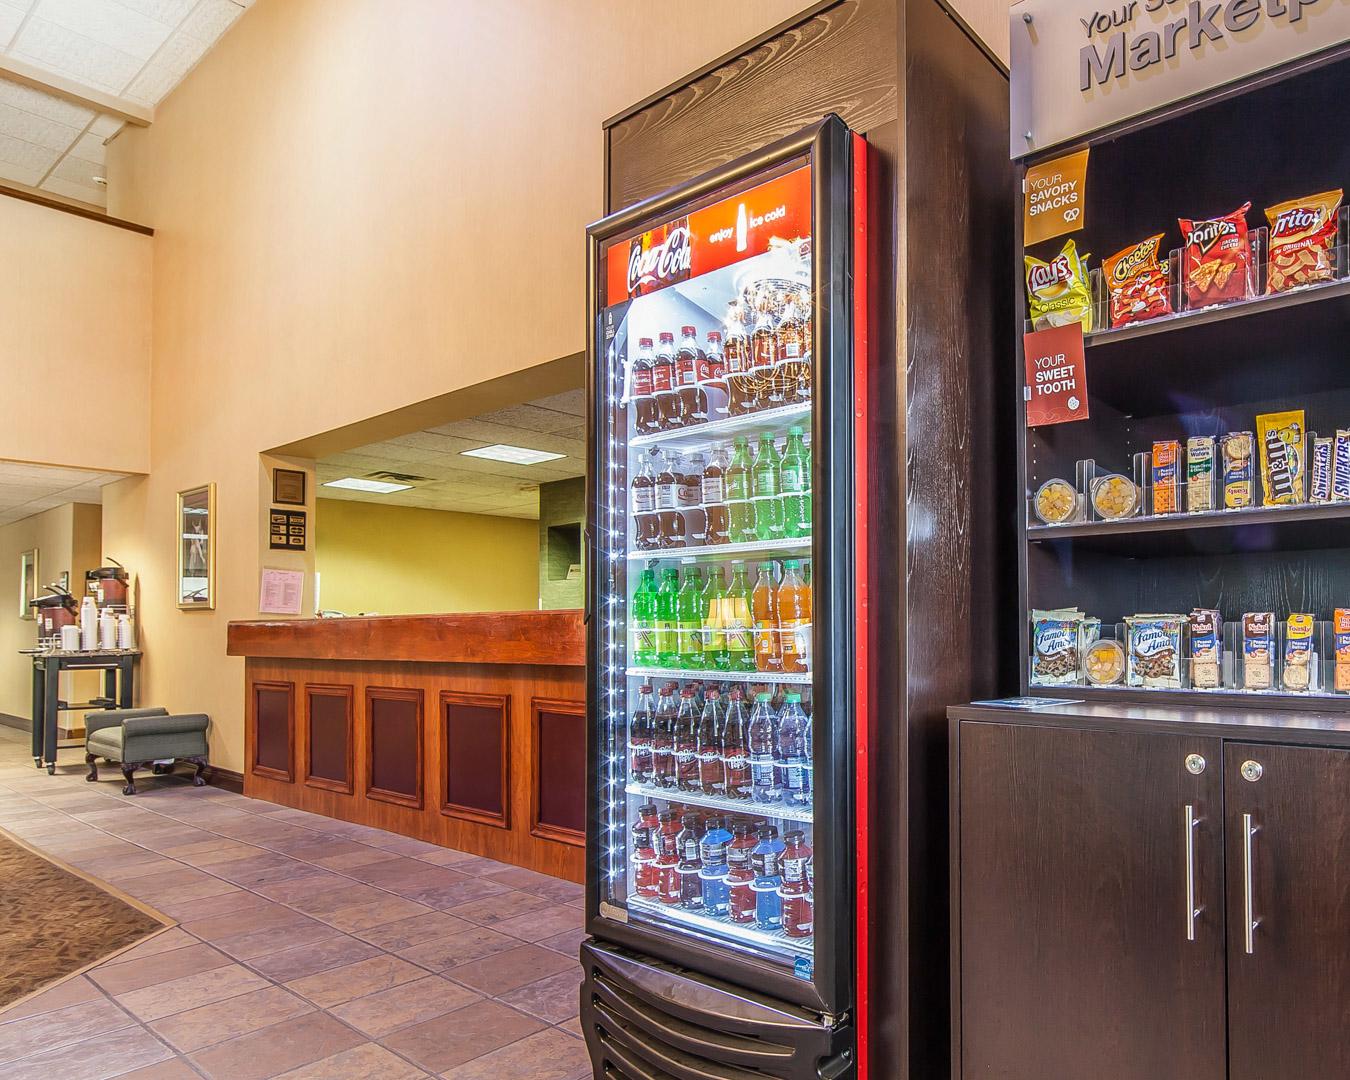 Comfort Suites Airport image 2